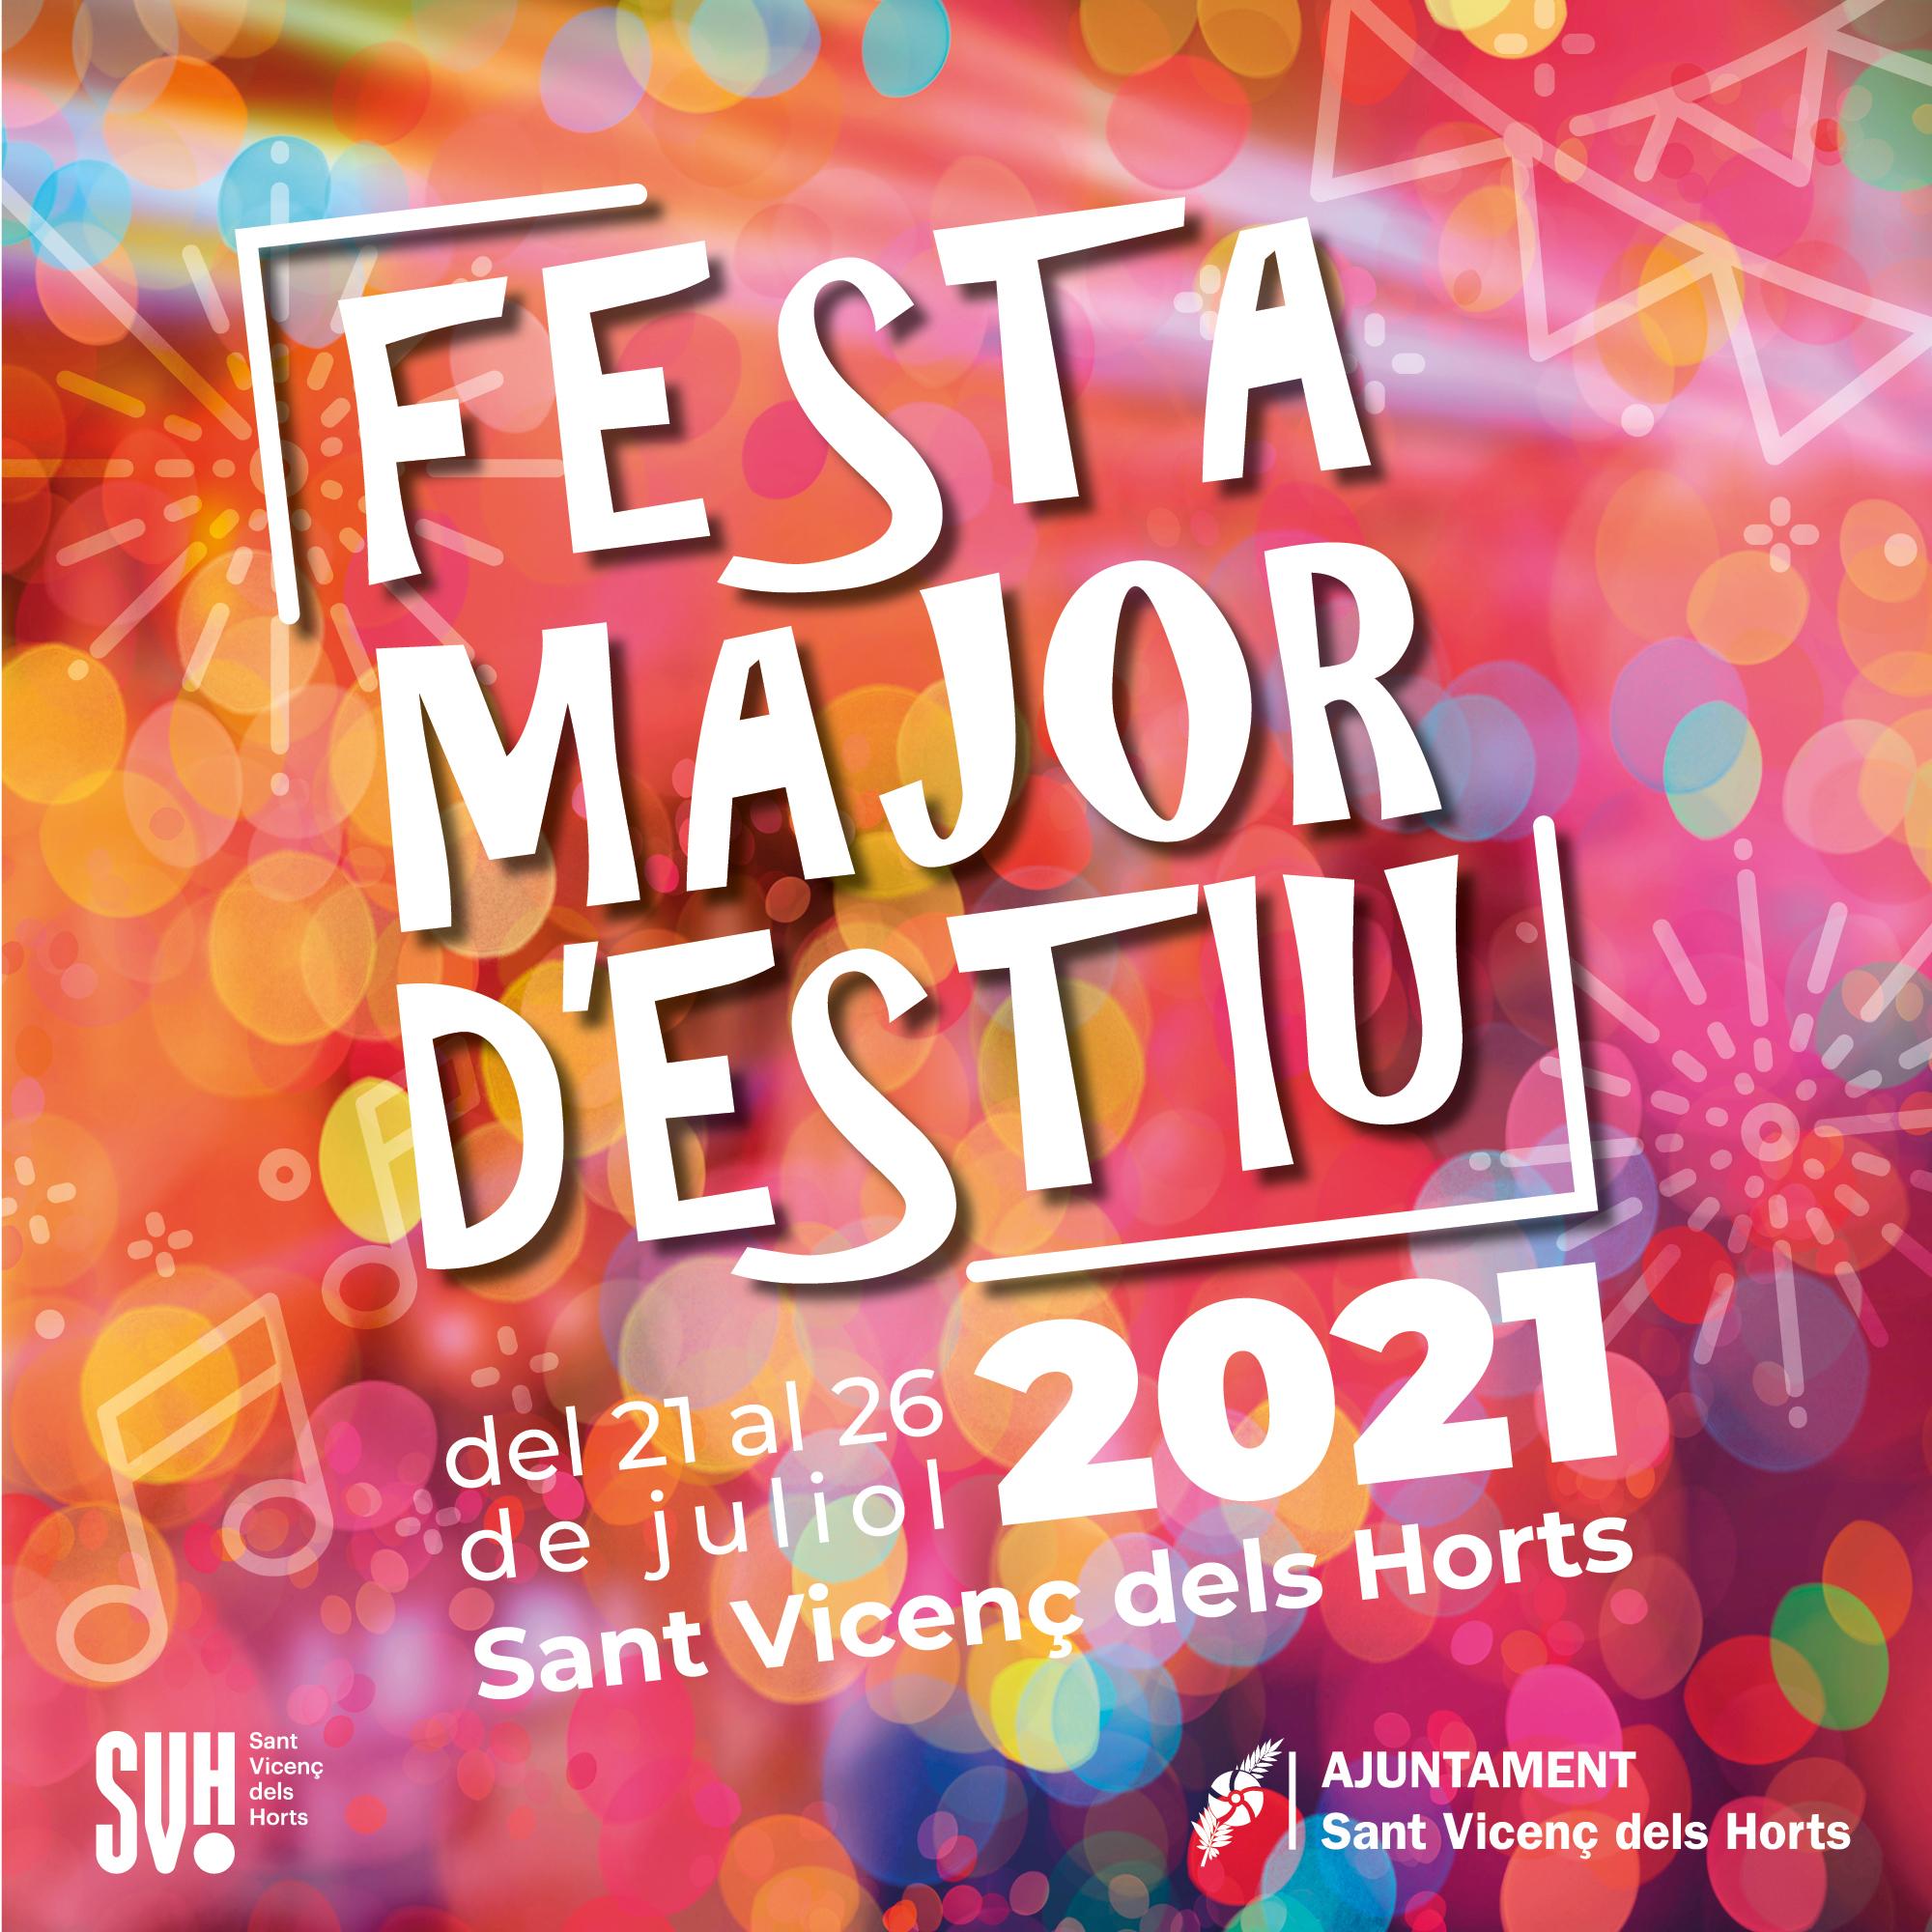 Fiesta Mayor de Verano 2021